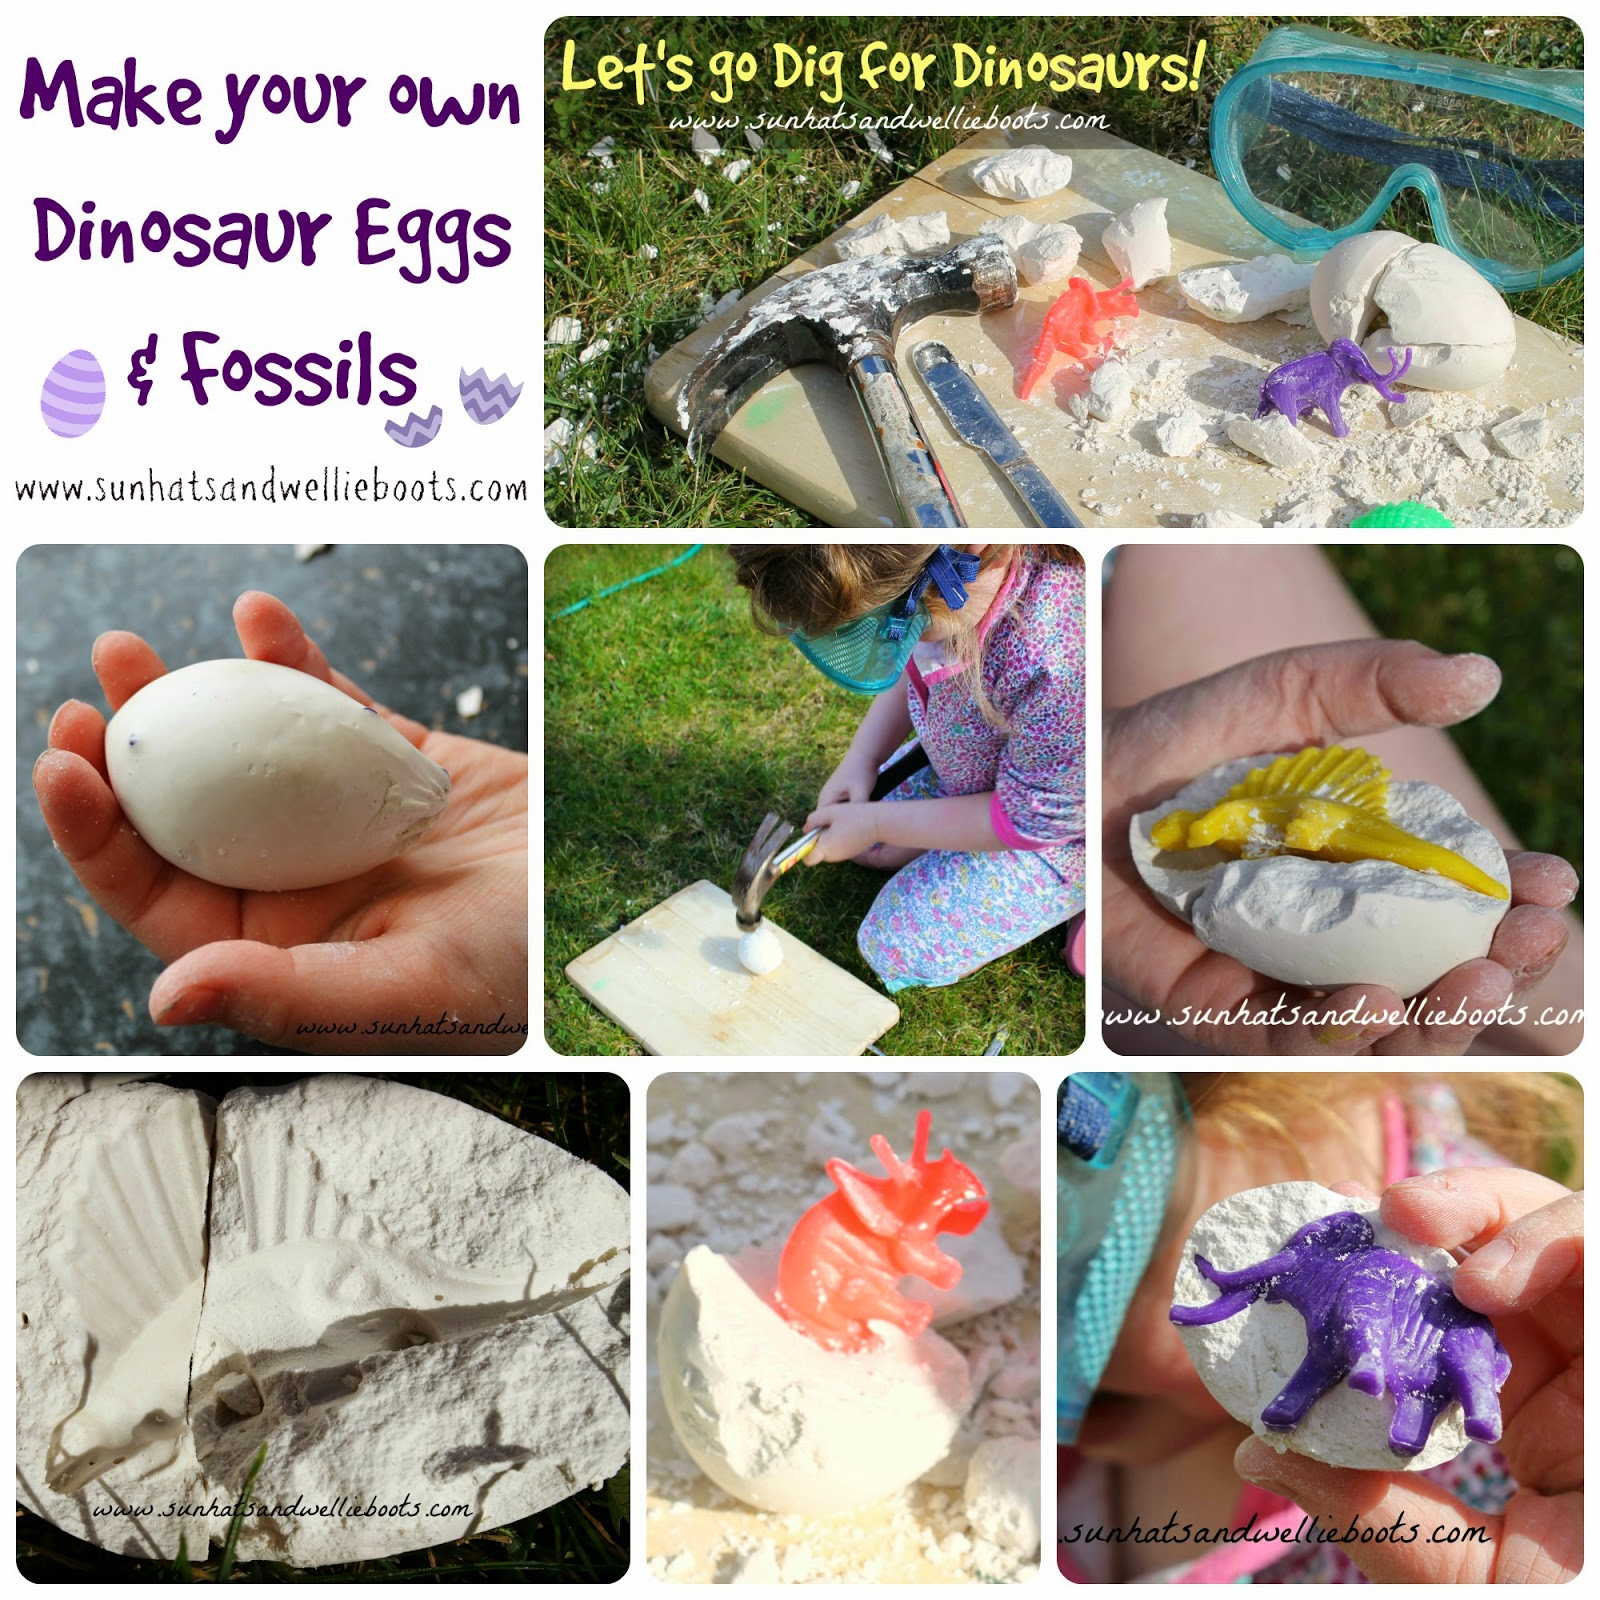 sun hats wellie boots diy dinosaur eggs fossil excavation